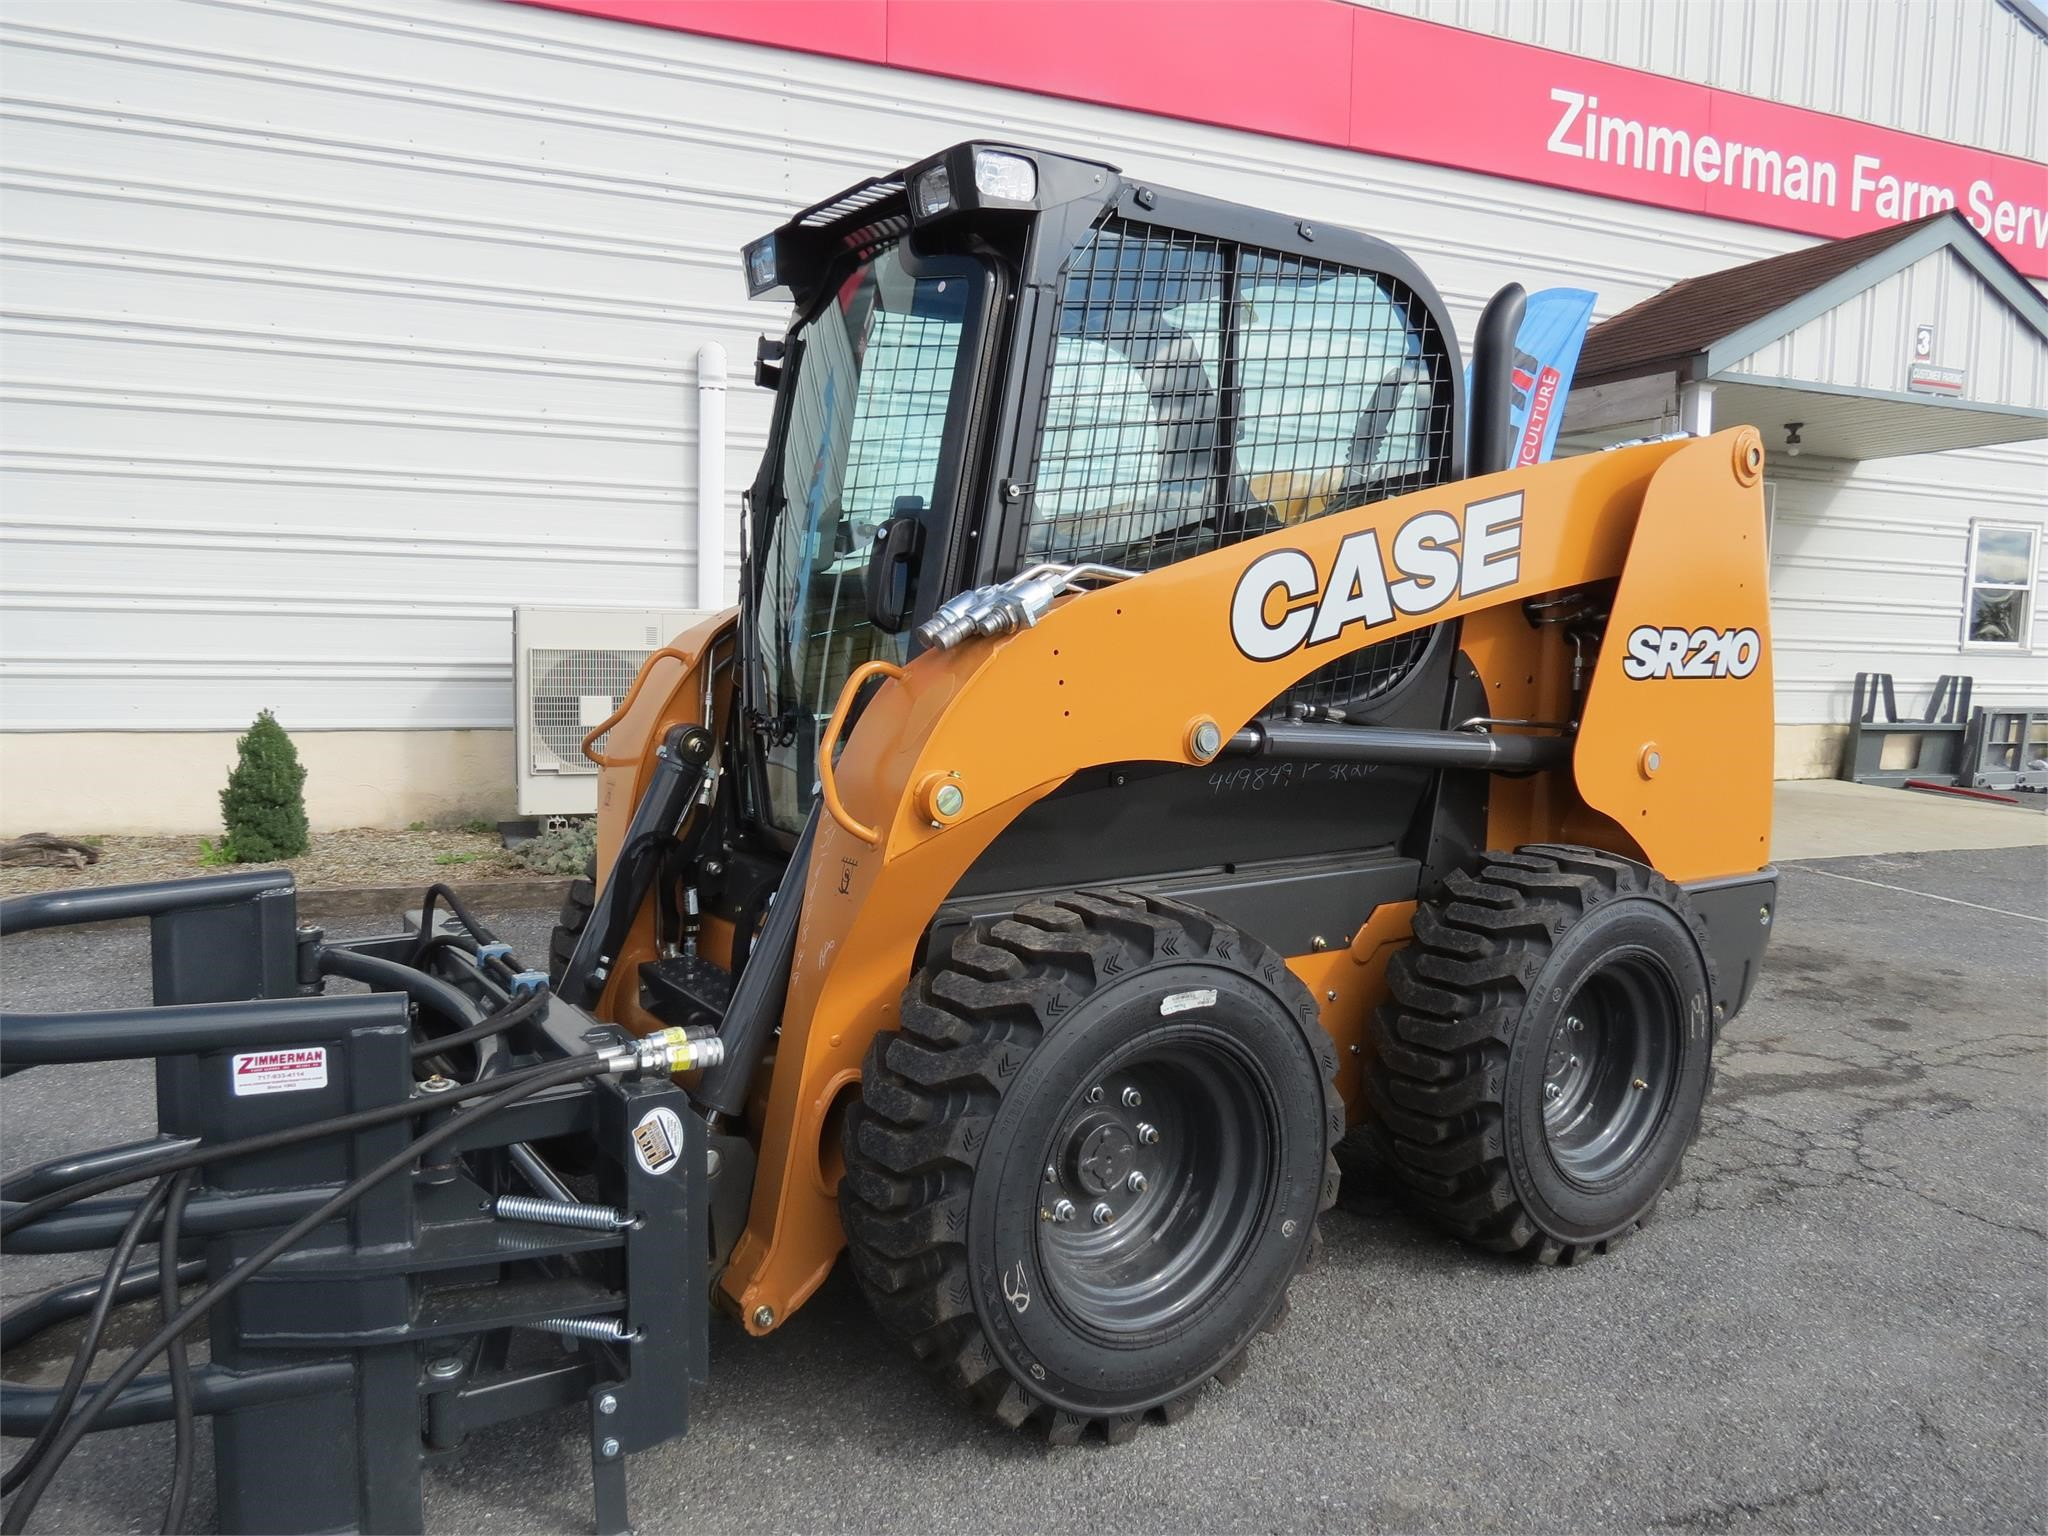 2019 Case SR210 Skid Steer